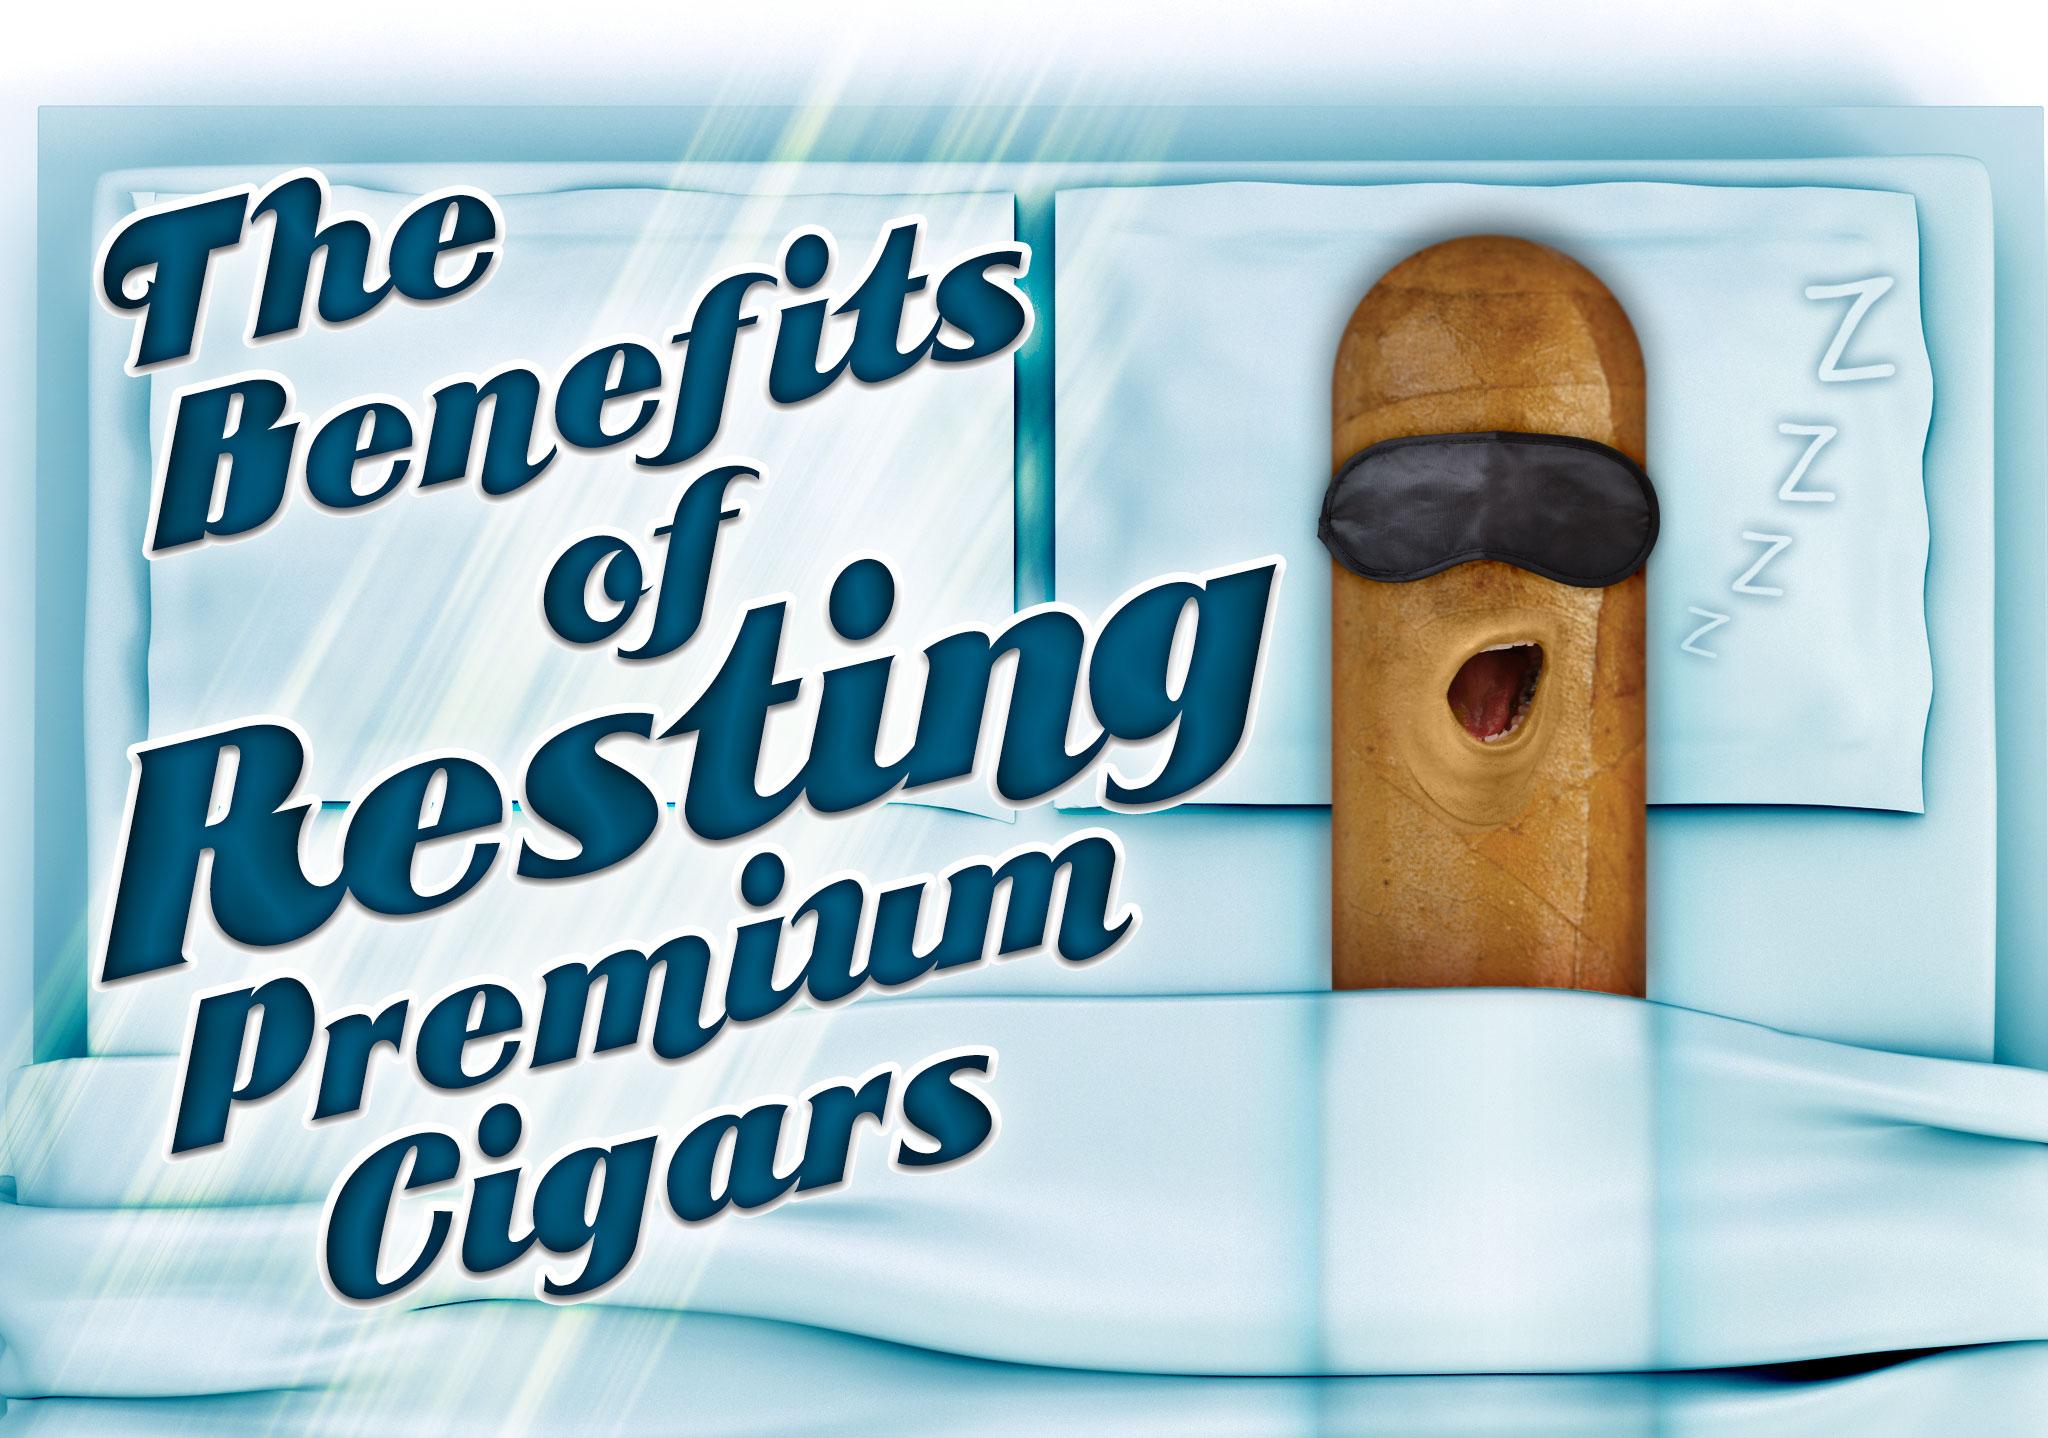 The Benefits of Resting Premium Cigars